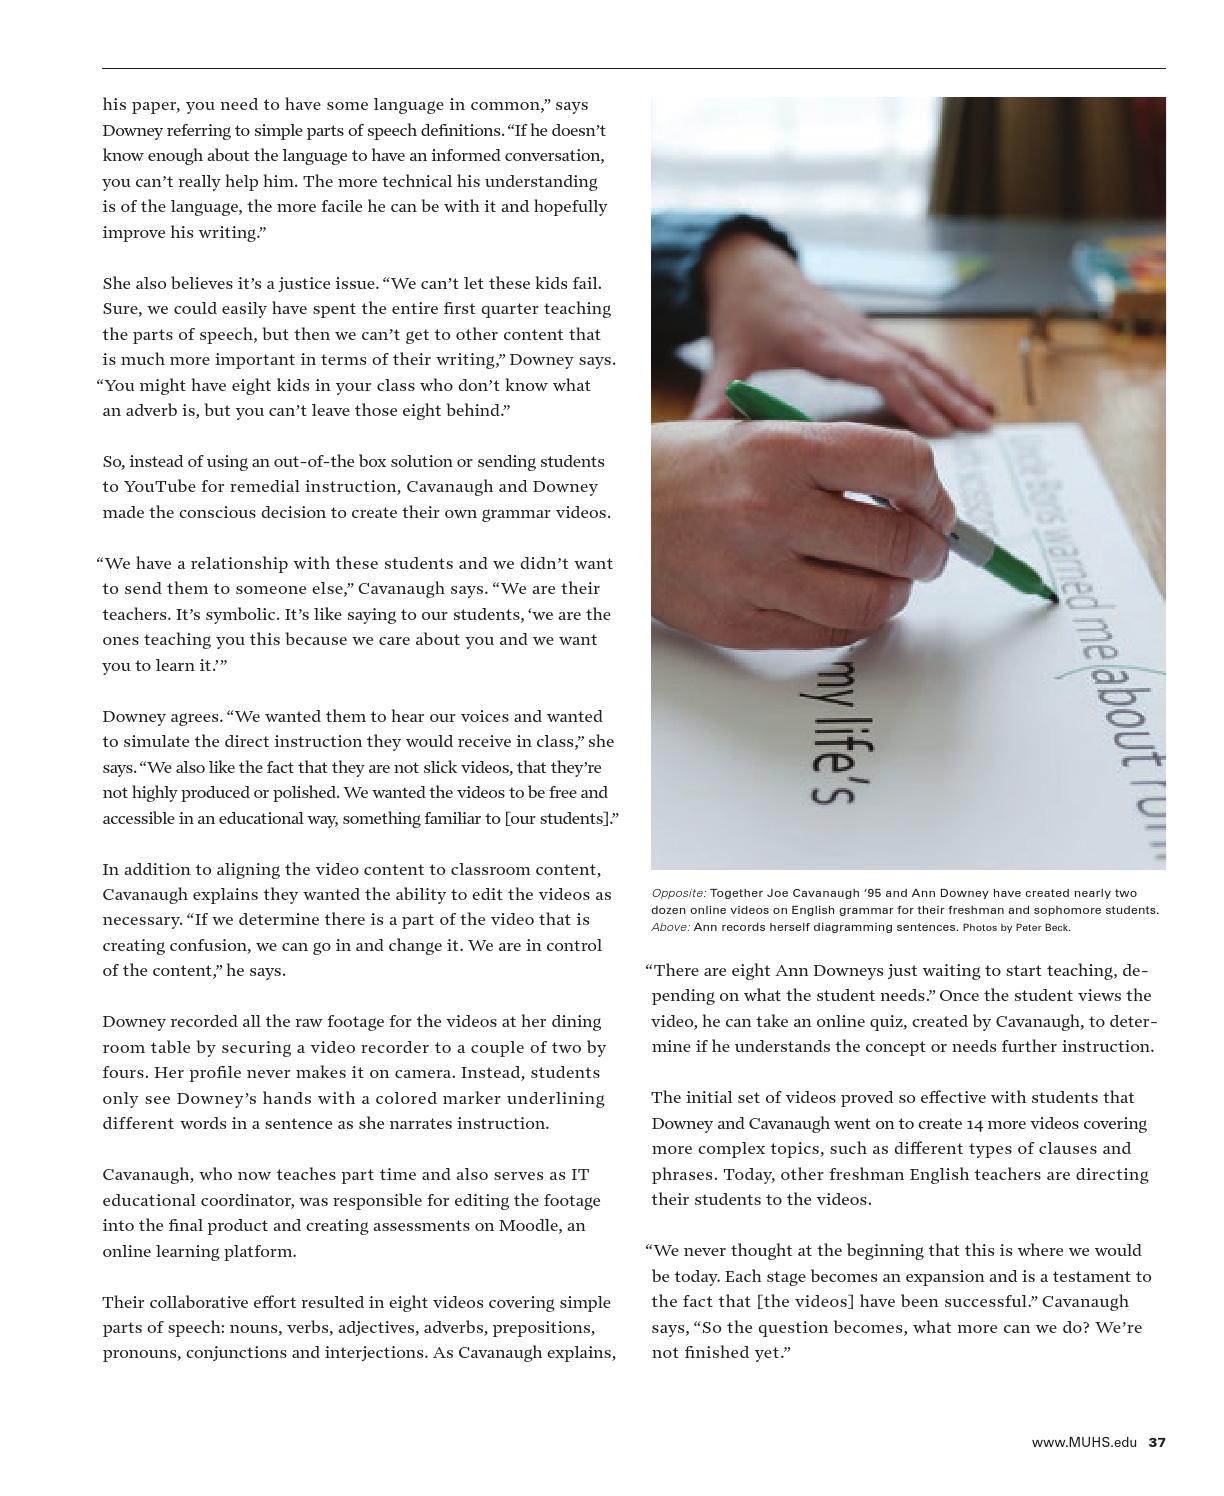 MUHS Magazine Winter/Spring 2015 by Marquette University